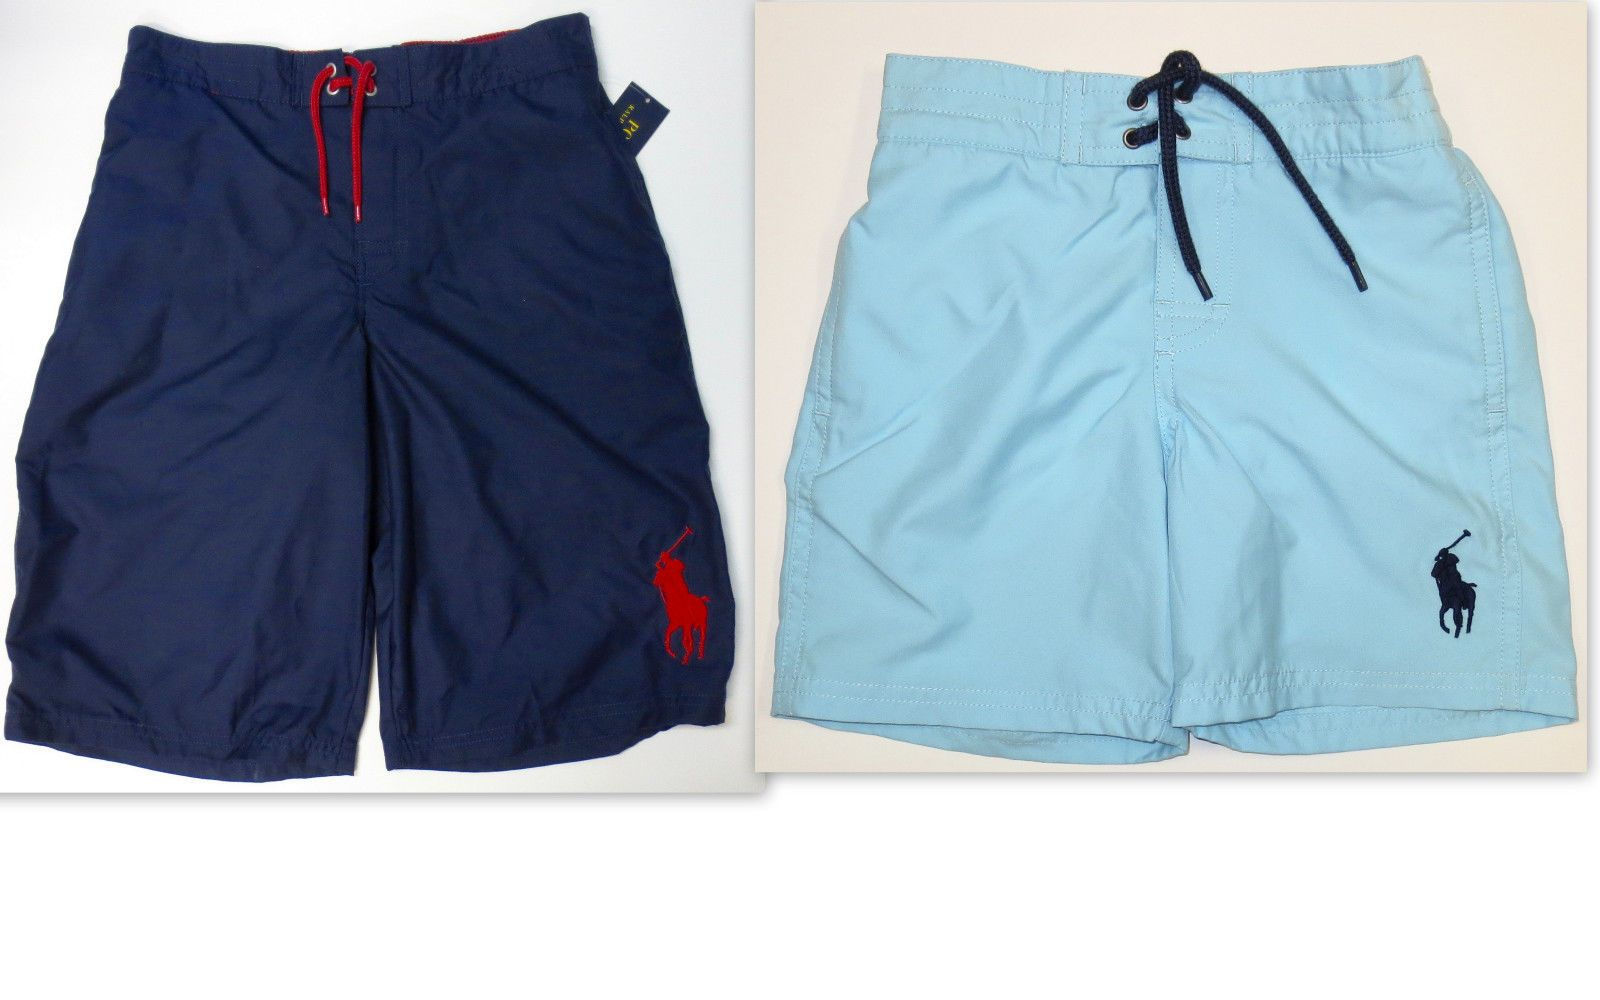 Swimwear 147339: Polo Ralph Lauren Boys Size 3 3T Swim Trunk Kids Toddler  Boxer Swimwear